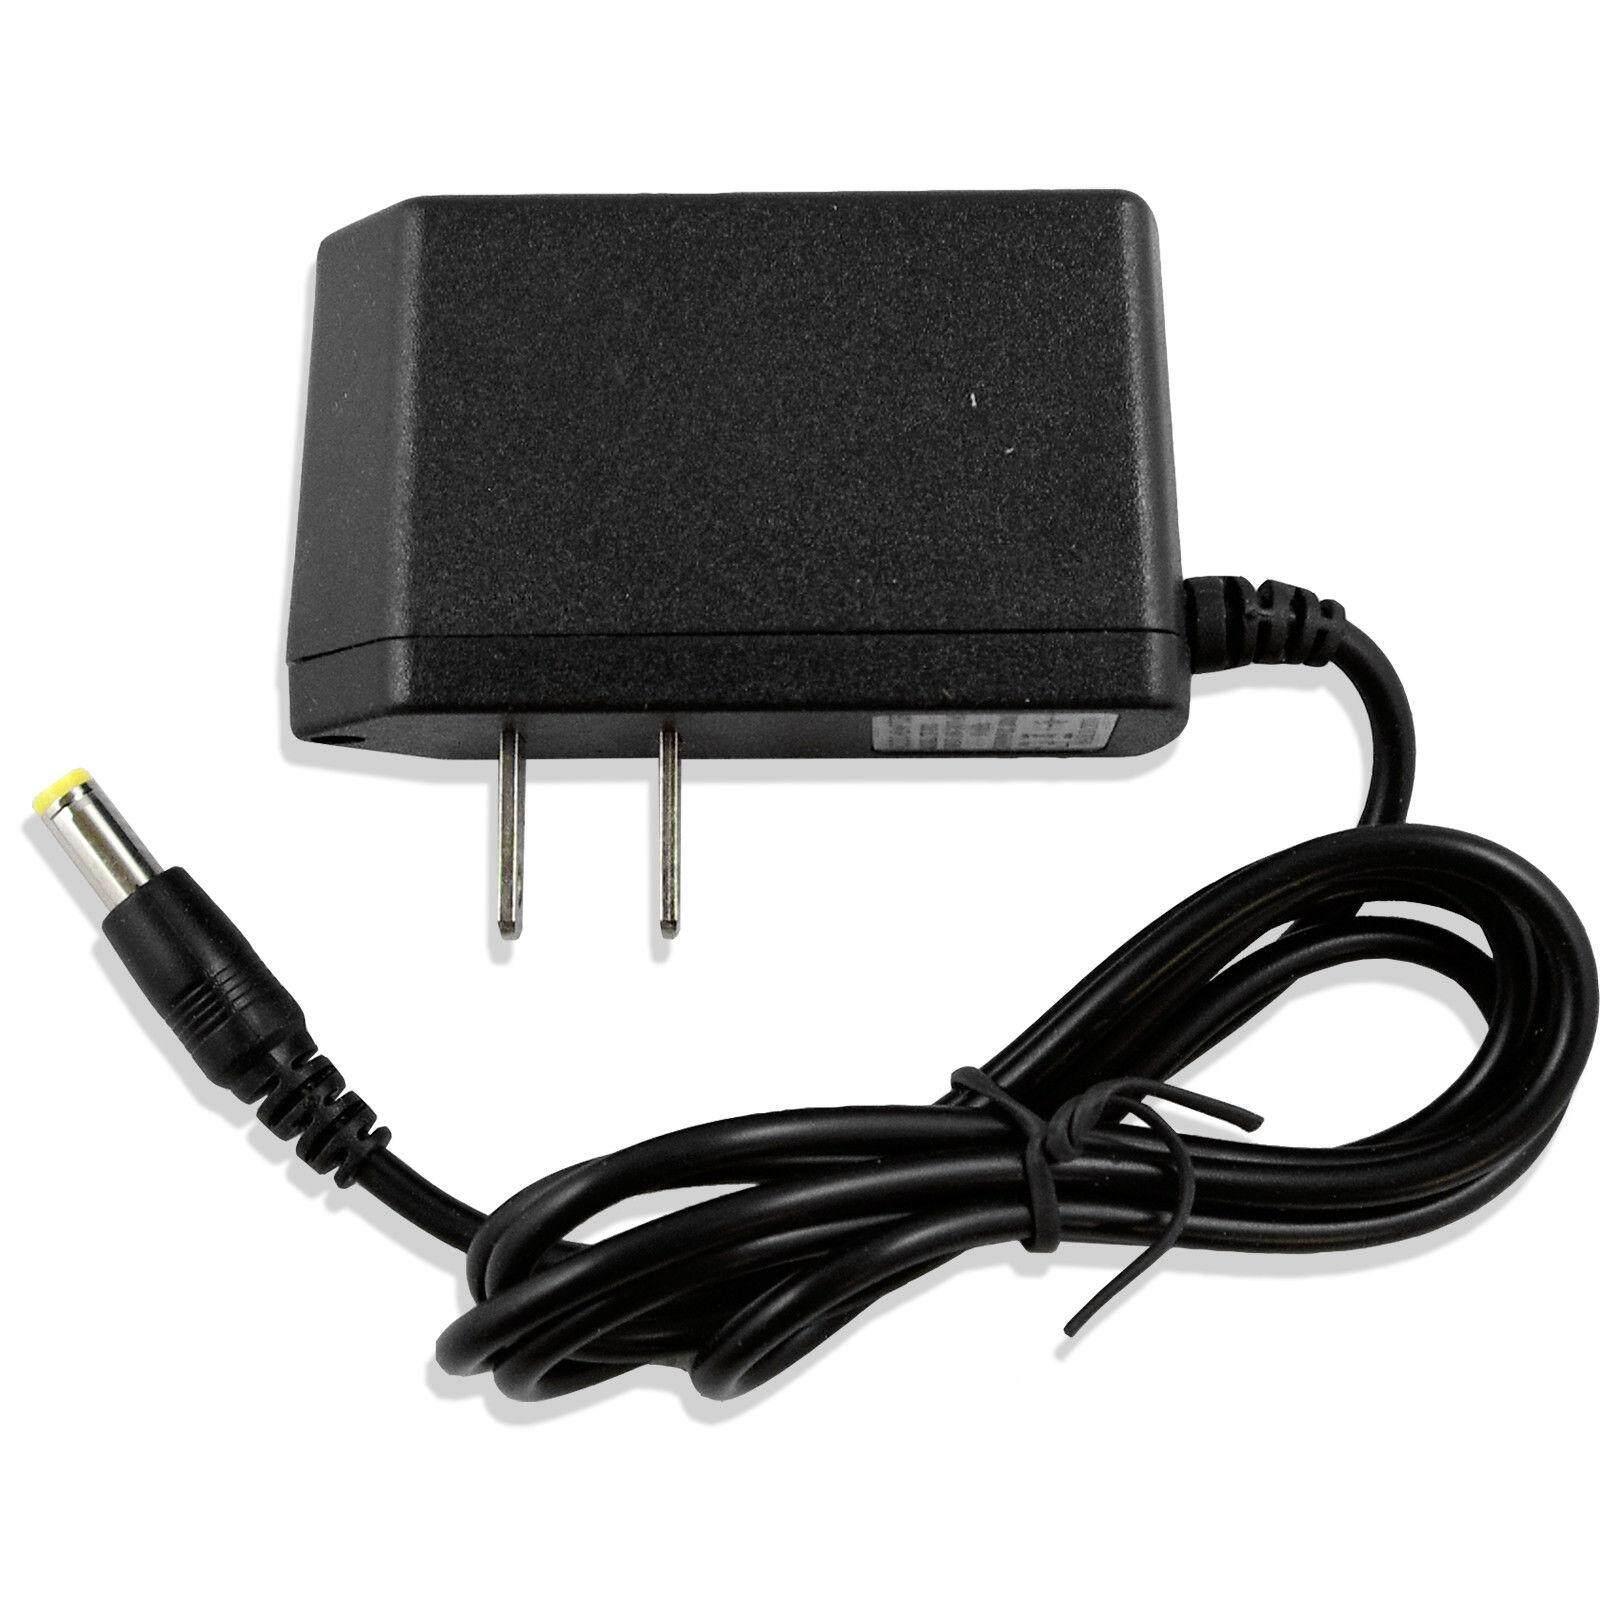 9V AC DC Adapter For Casio CTK-631 CTK631 CTK-481 CTK-560L CTK-560 Keyboard New